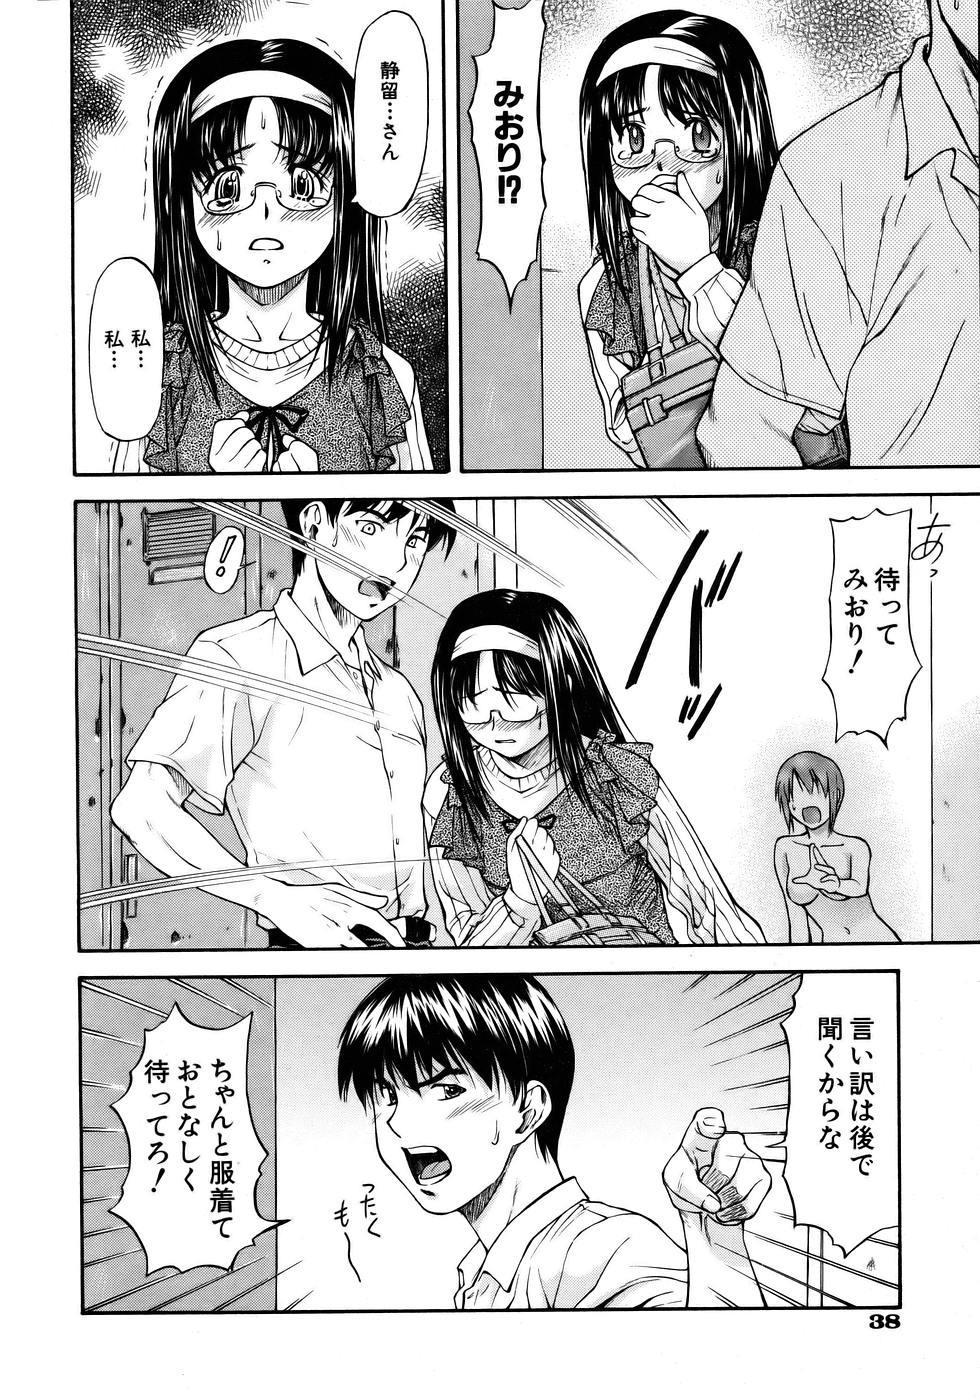 COMIC AUN 2005-12 Vol. 115 37